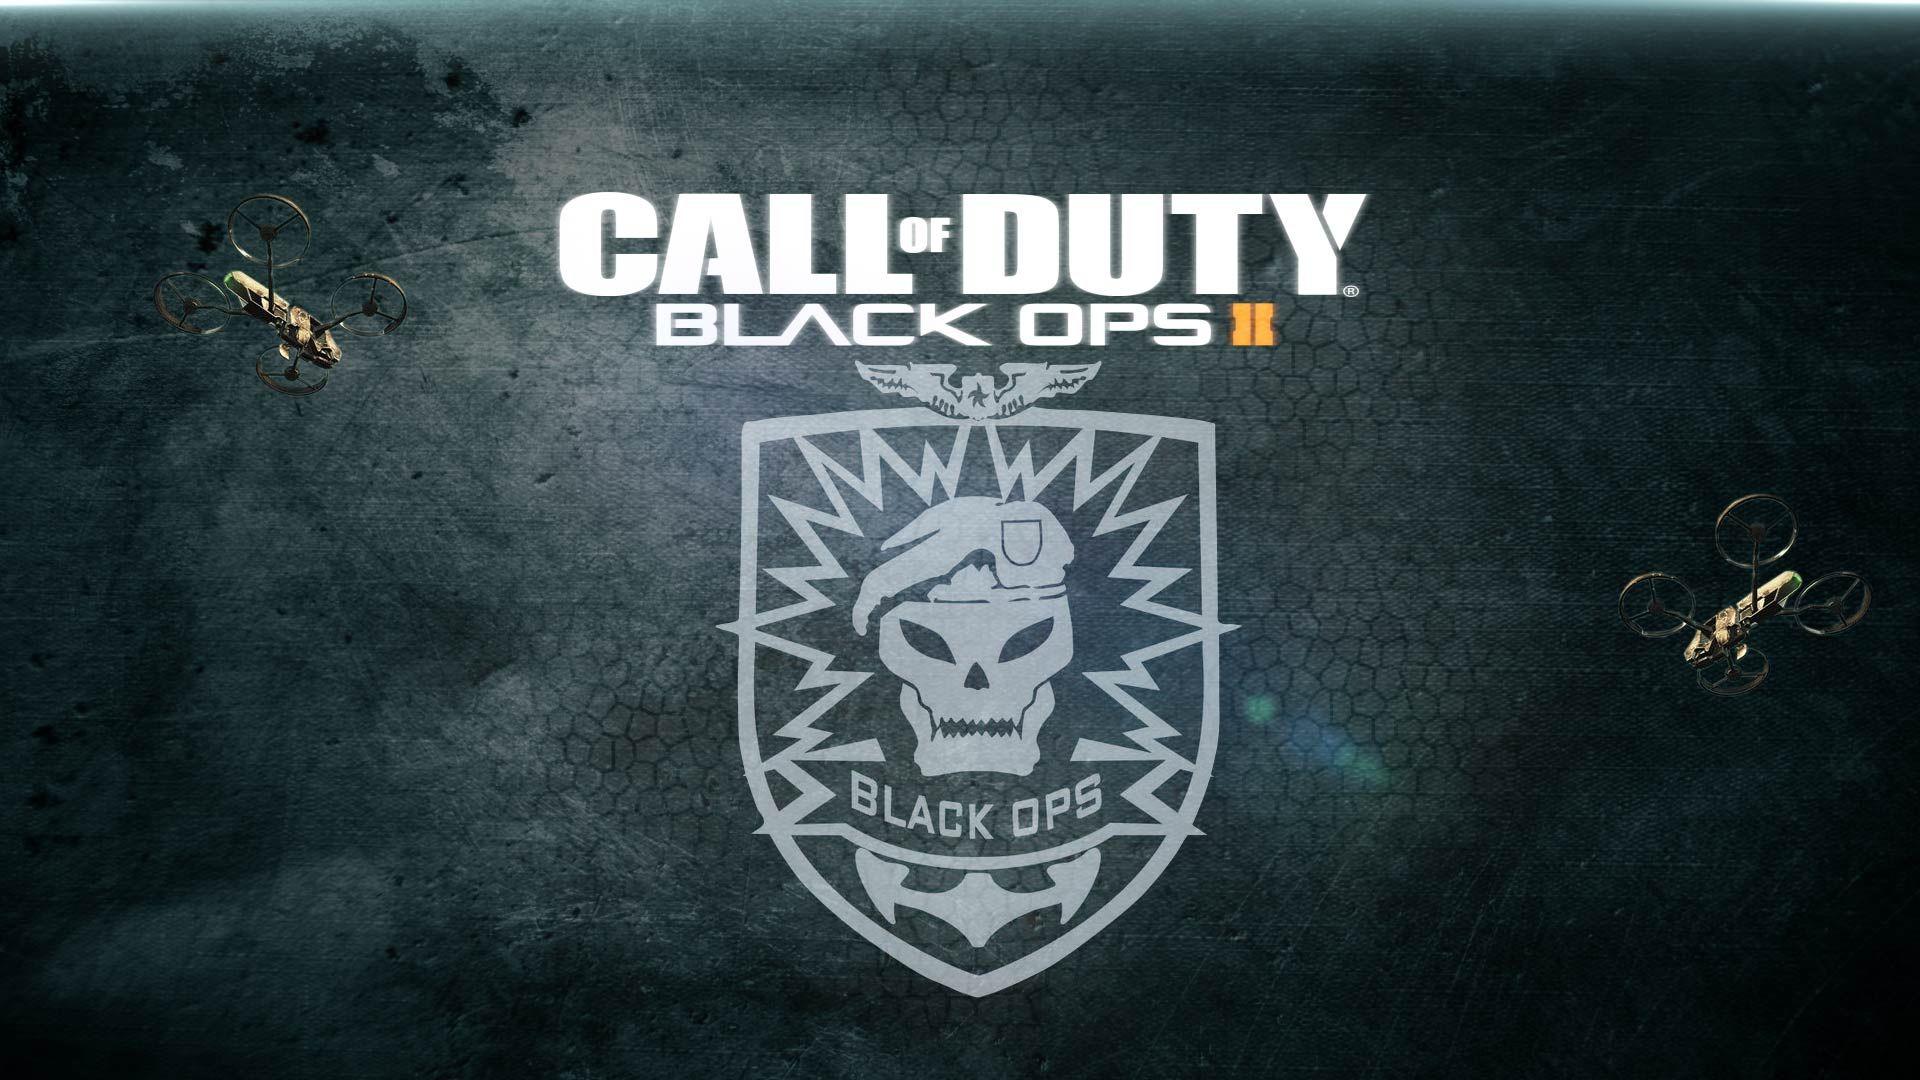 Call Of Duty Black Ops II HD Desktop Wallpaper Widescreen High 1920x1200 Wallpapers 2 35